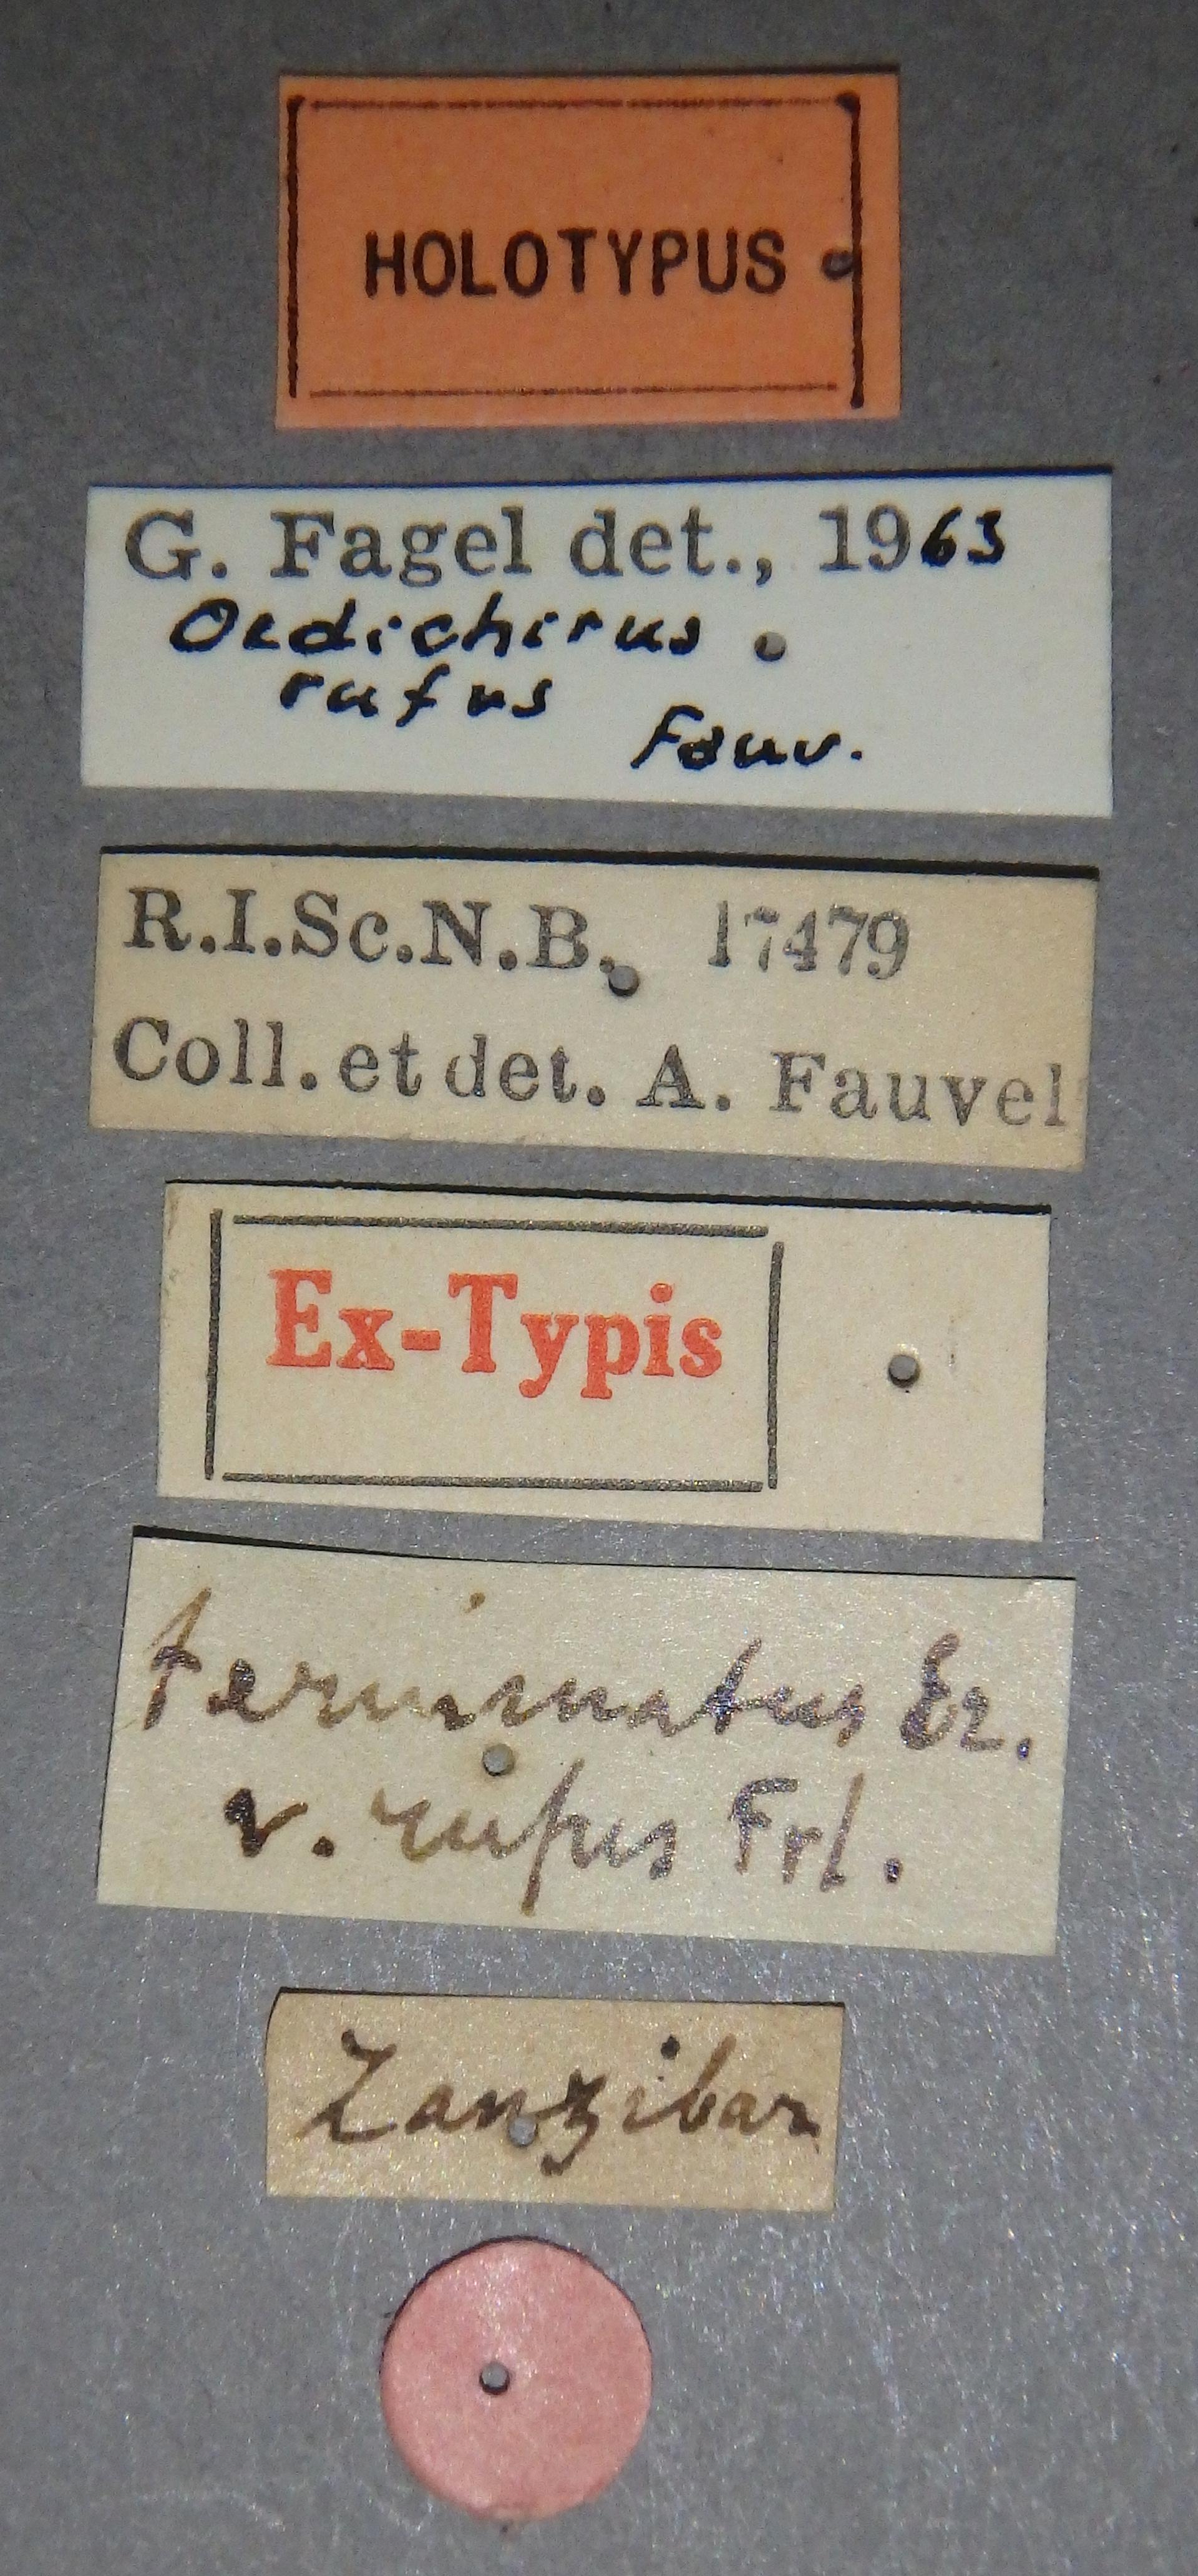 Oedichirus terminatus variety rufus ht Lb.JPG